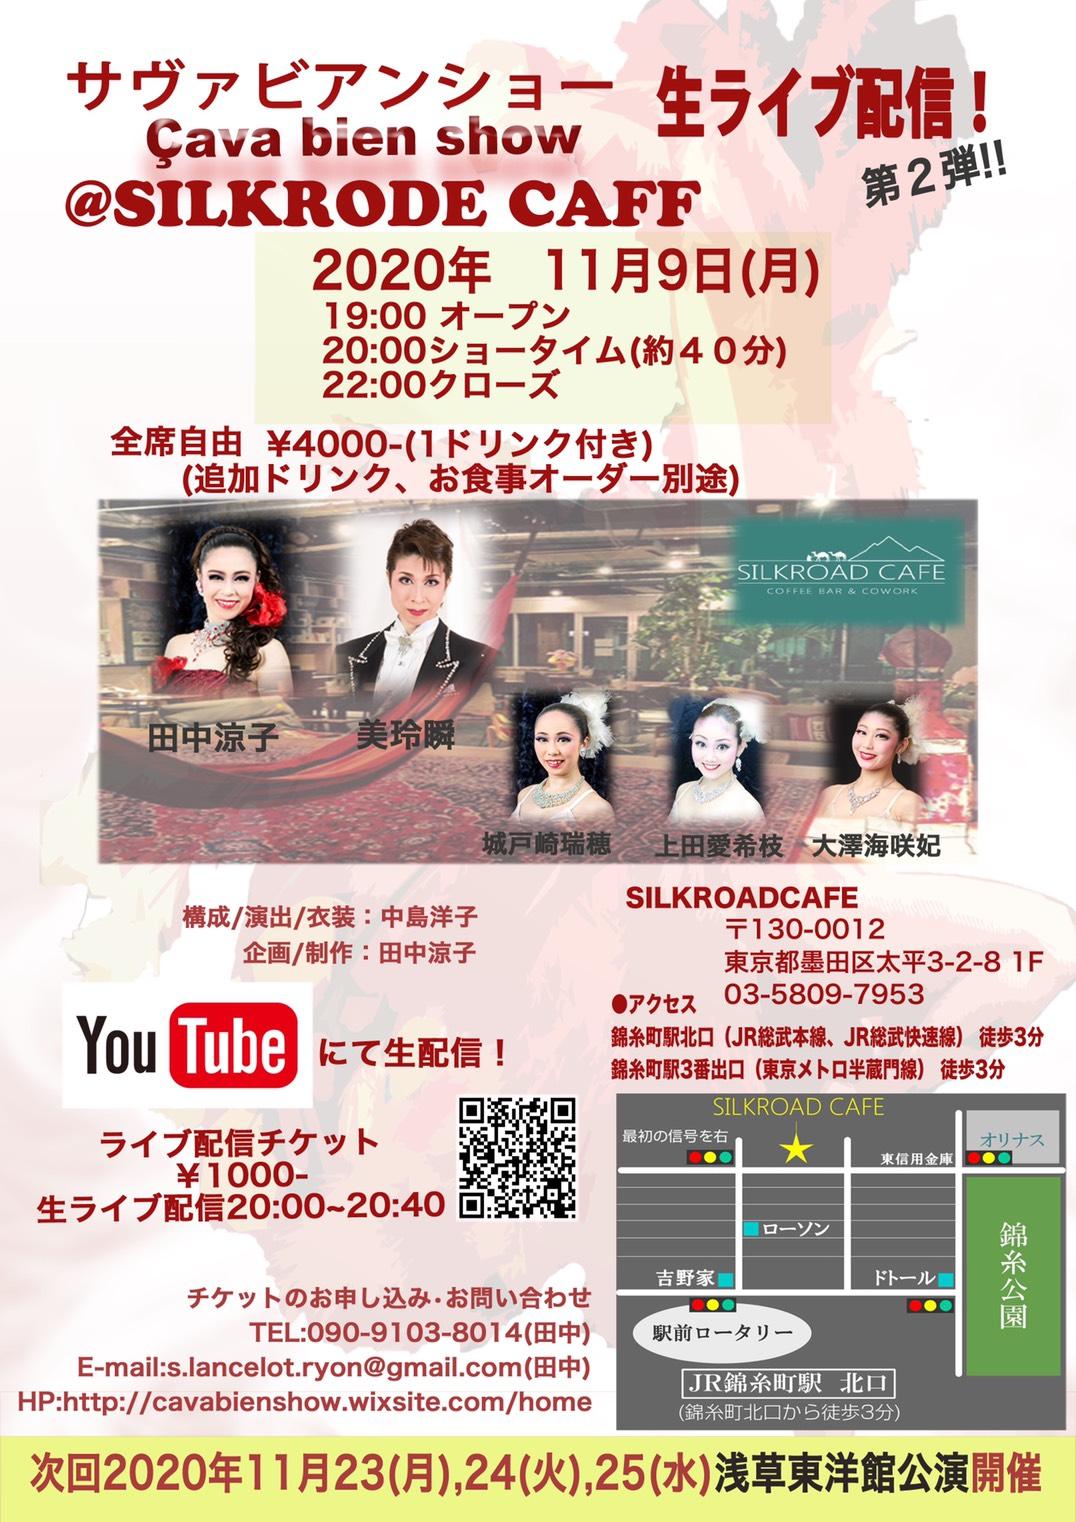 S__60153879